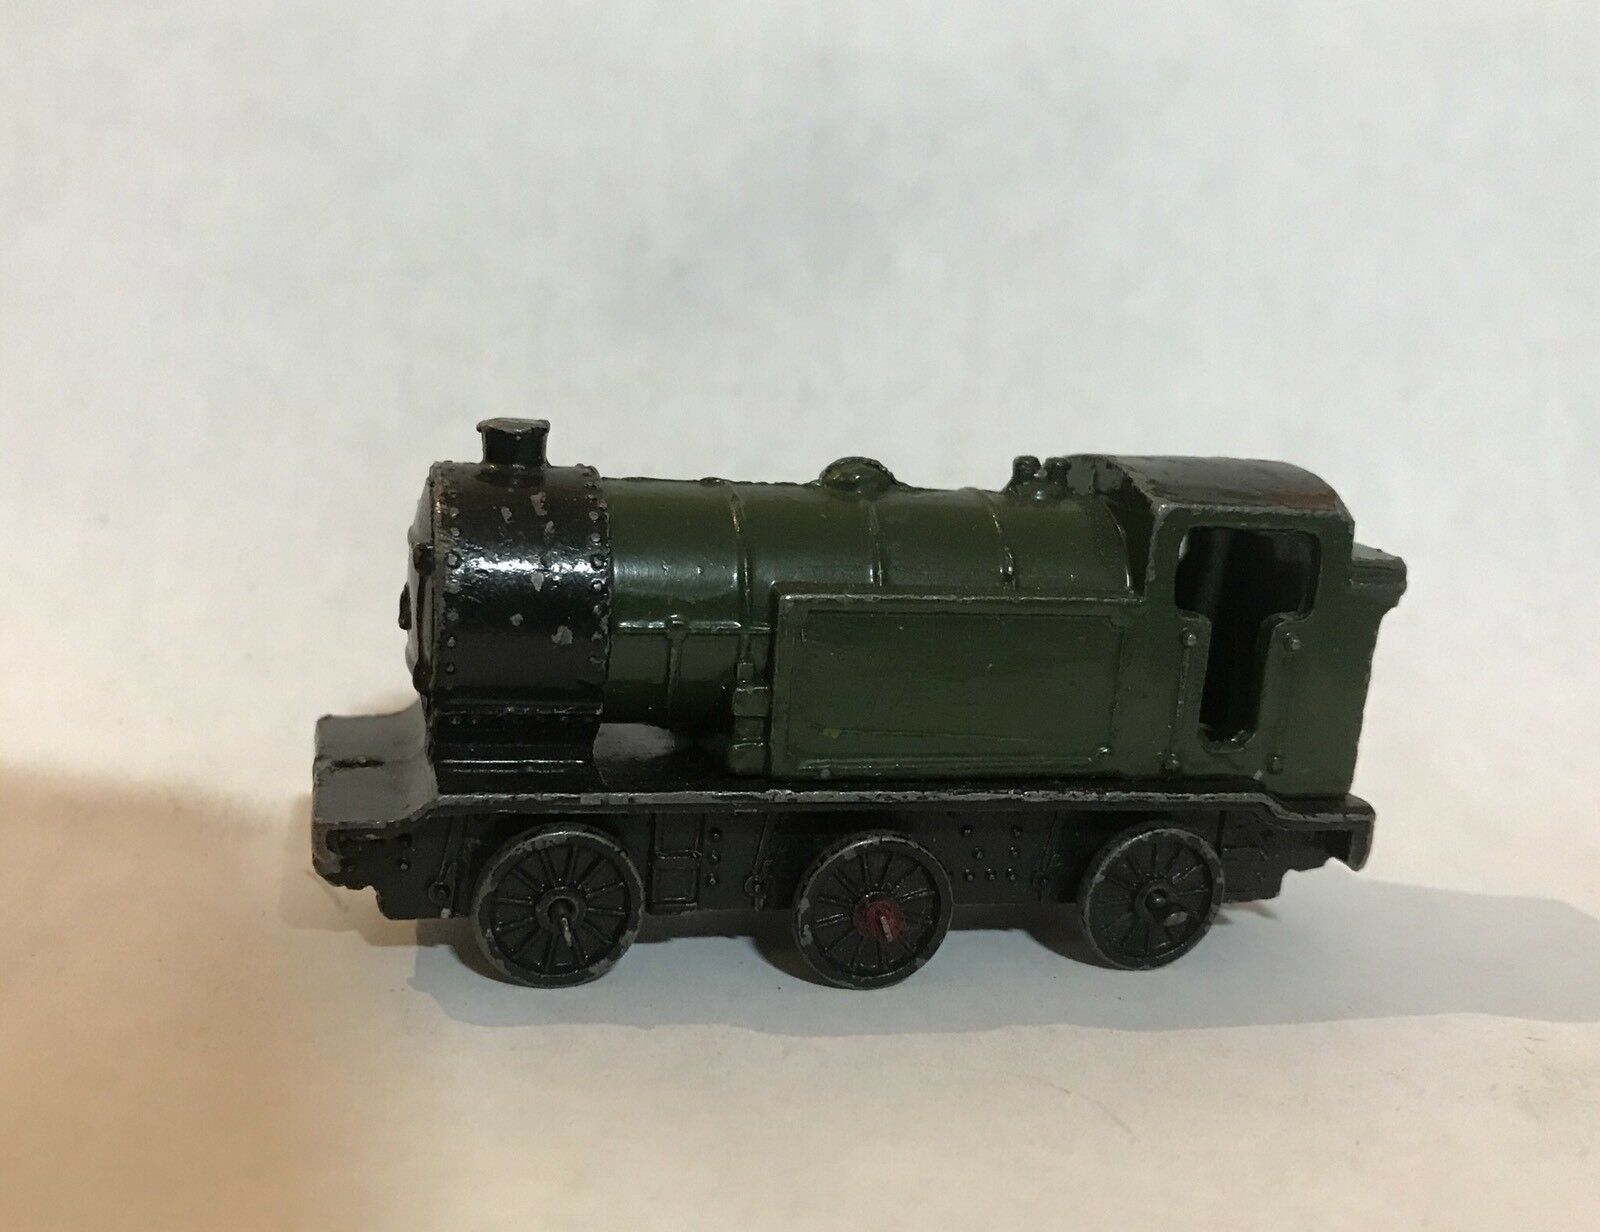 Meccano Dinky pre war lead locomotive